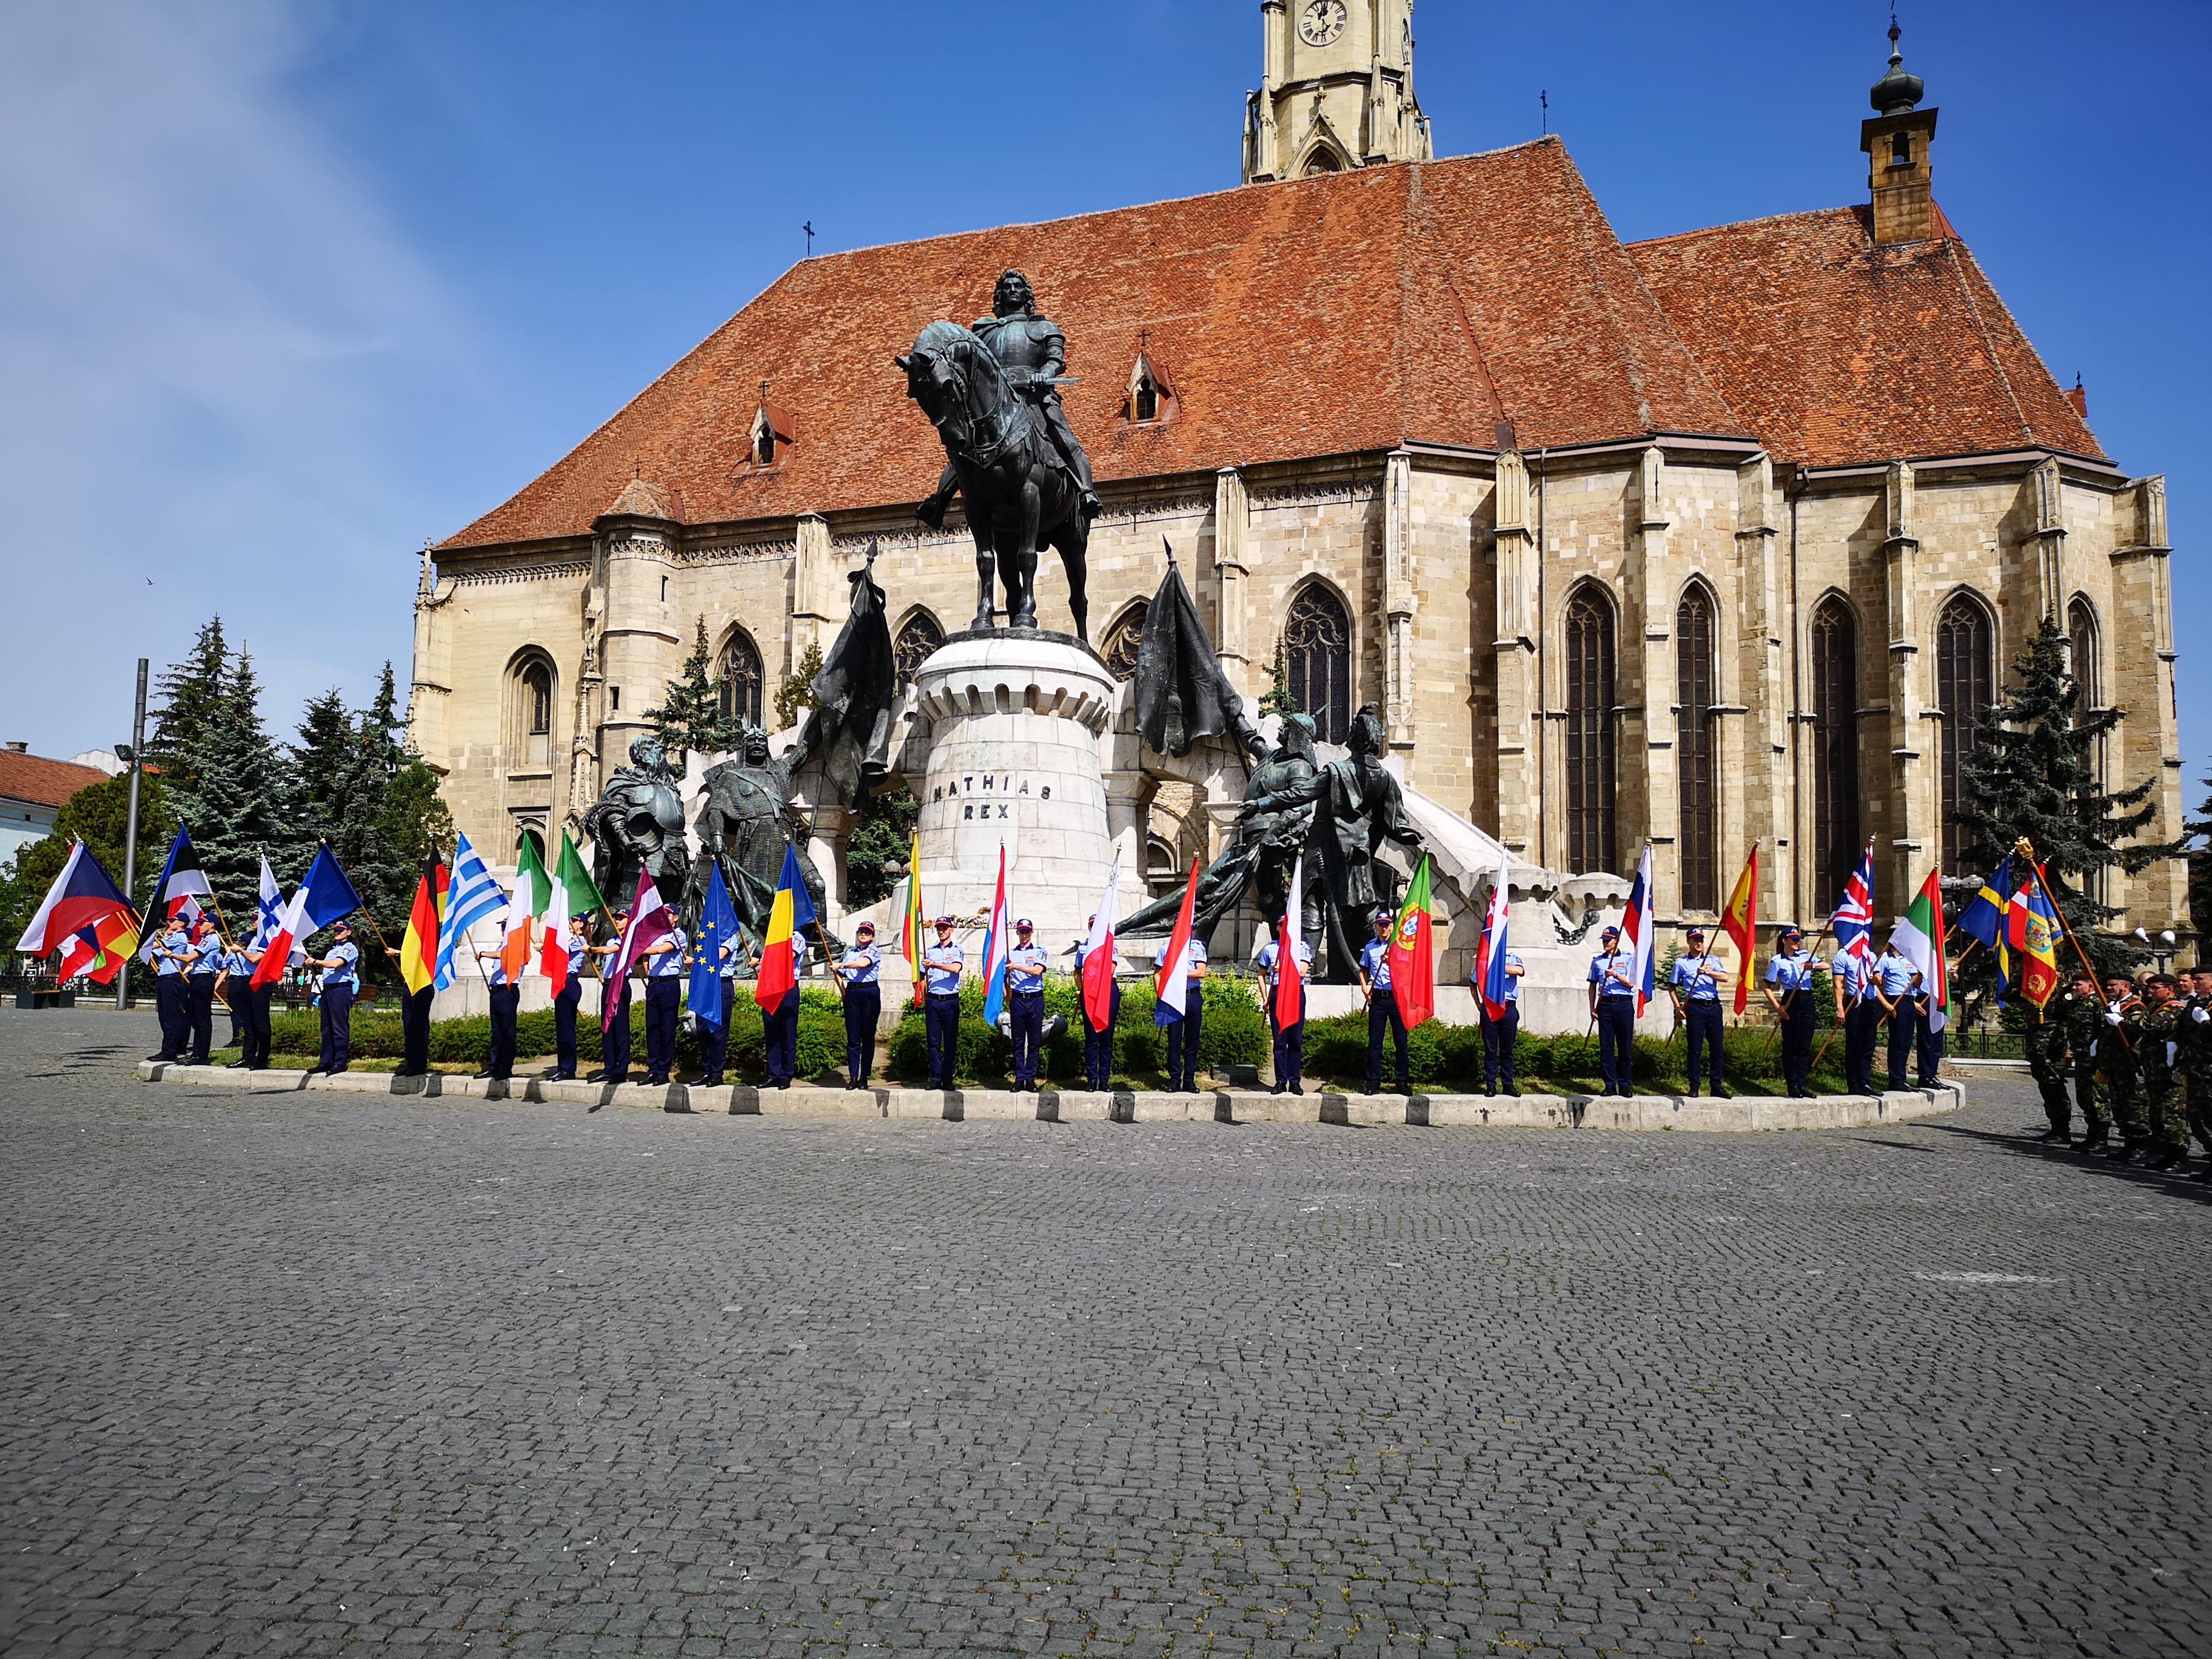 Ziua Europei 2018 - Foto: Mediafax